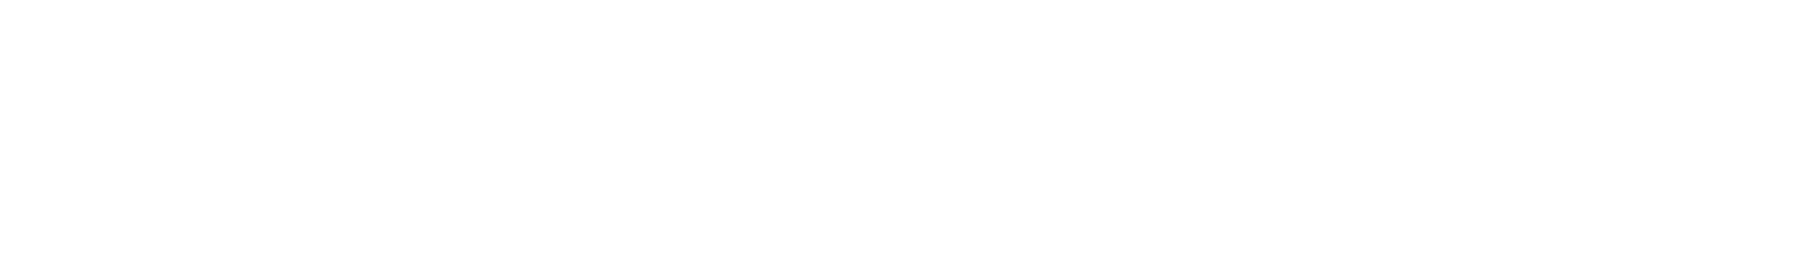 guitarrock03 80